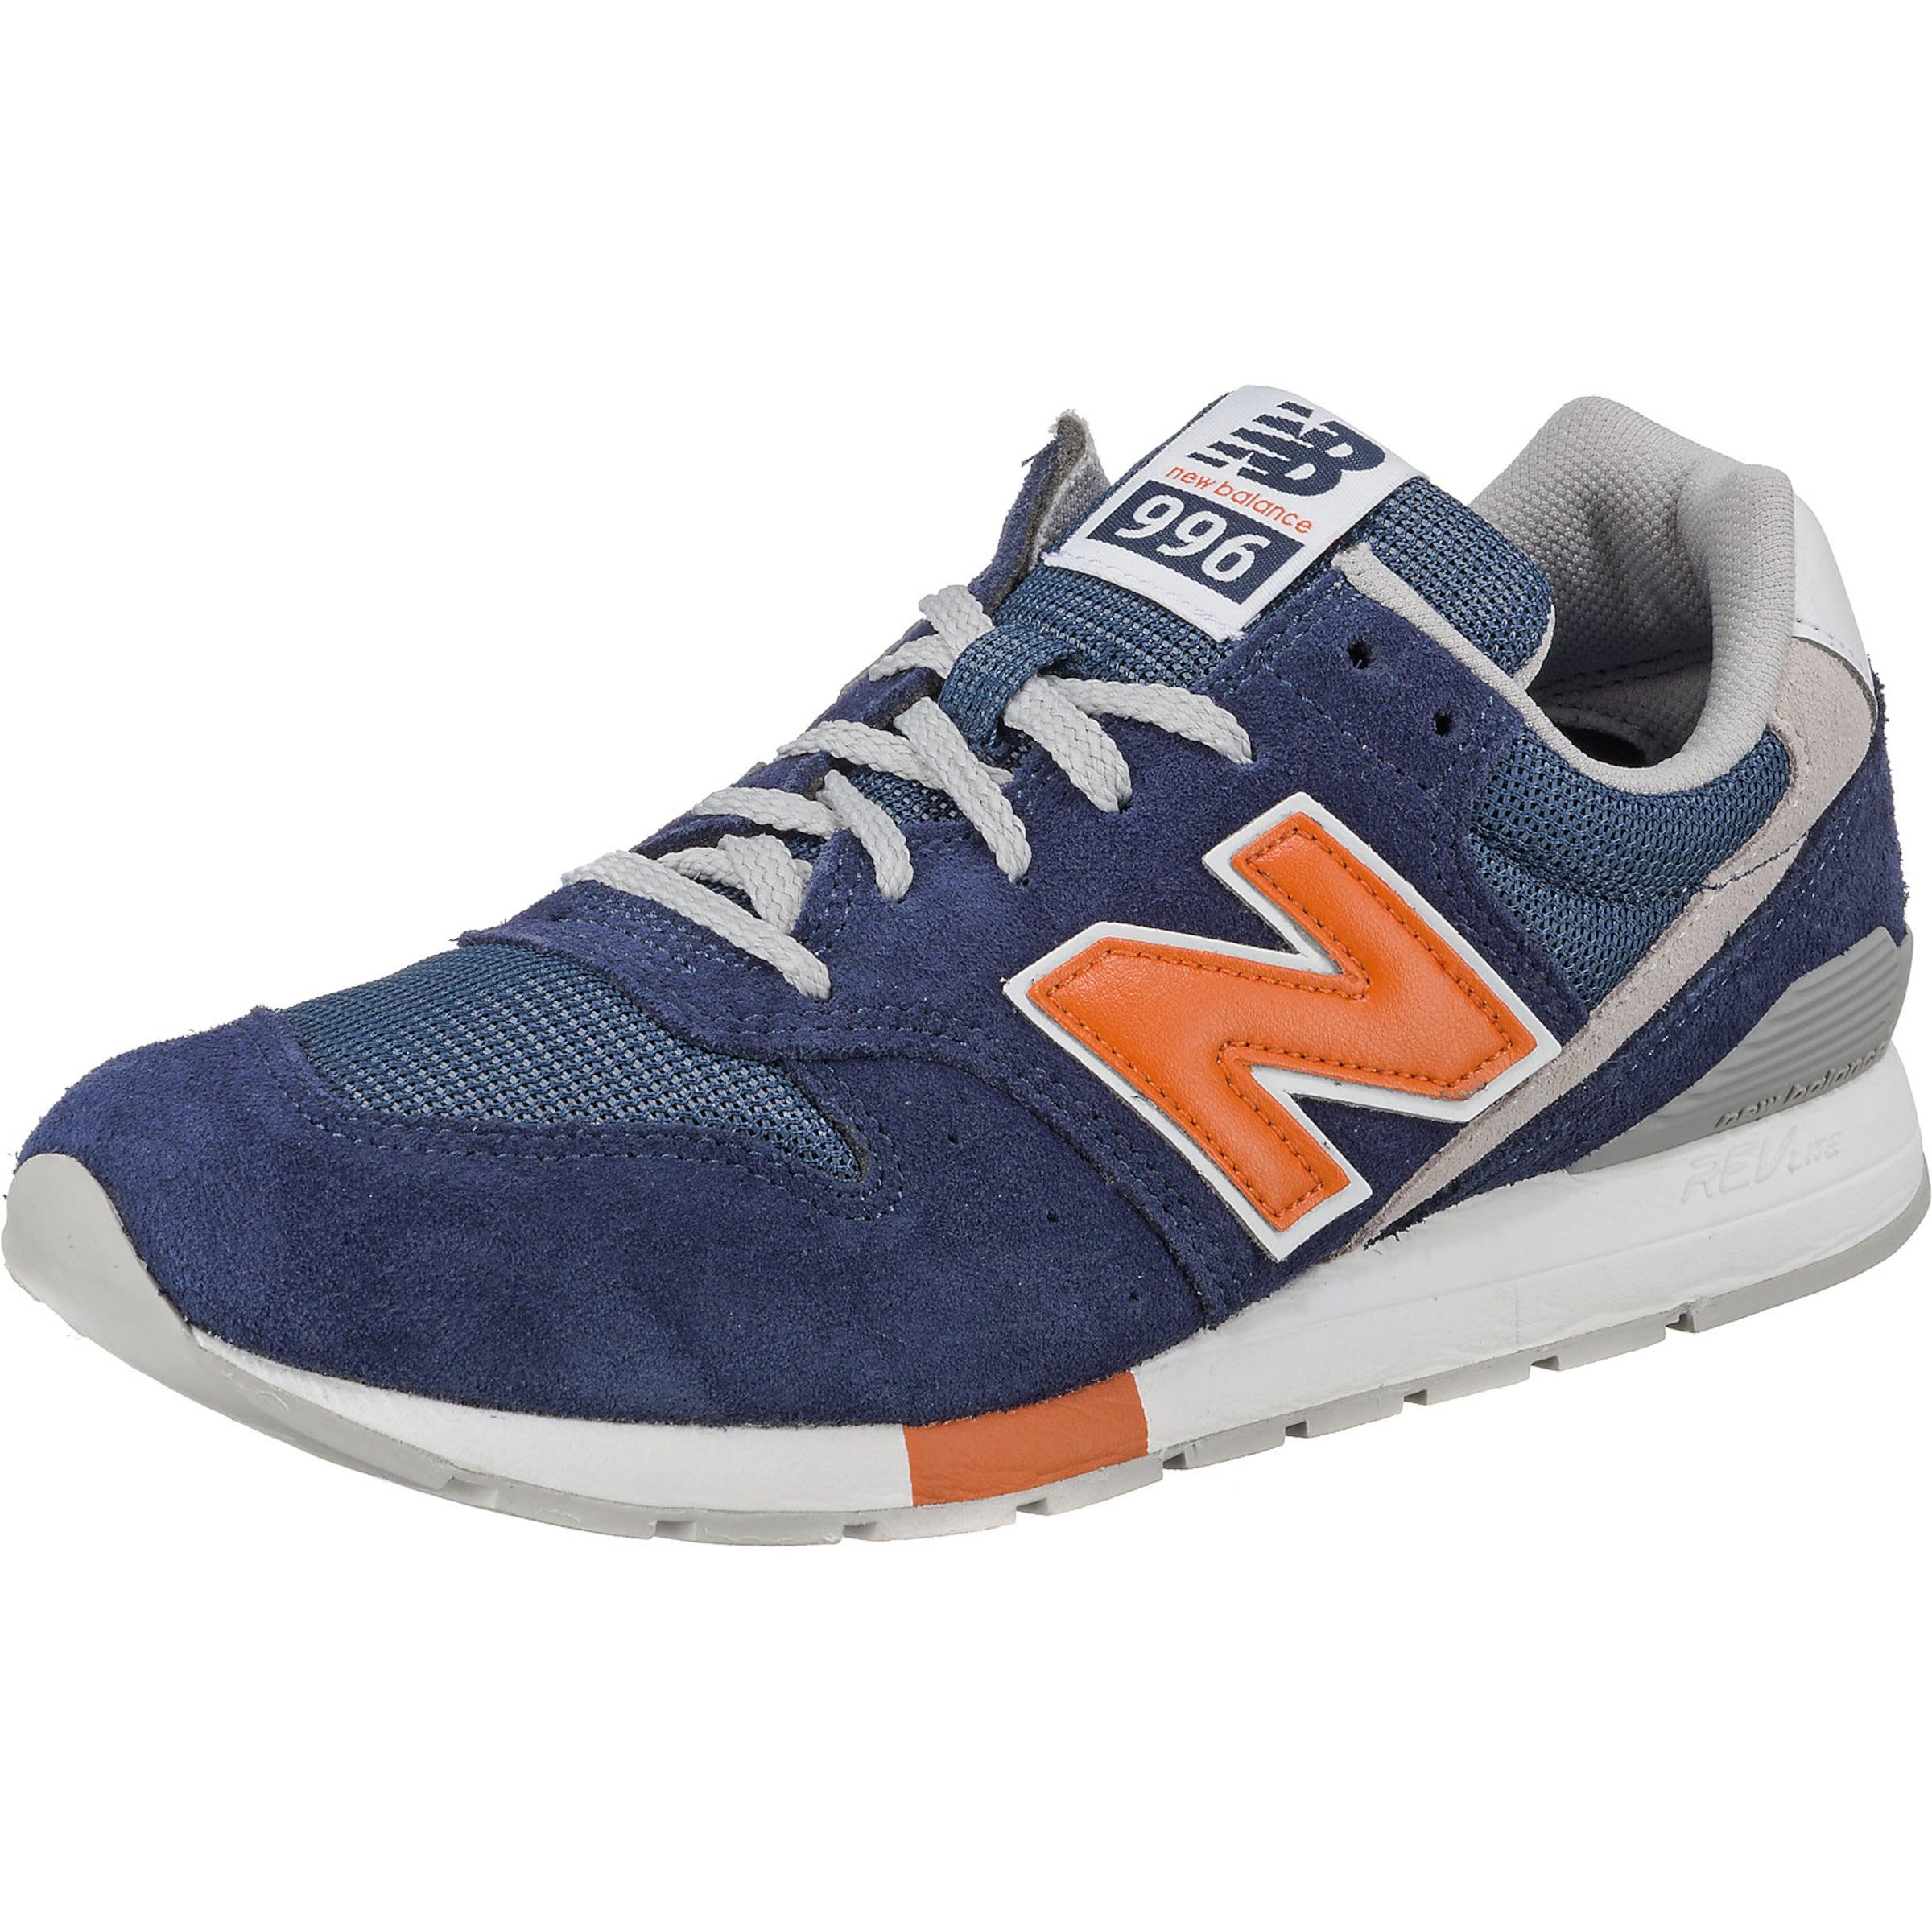 New En Balance Basses Bleu Foncé Blanc 'mrl996' NuitOrange Baskets 9WHYbEIeD2